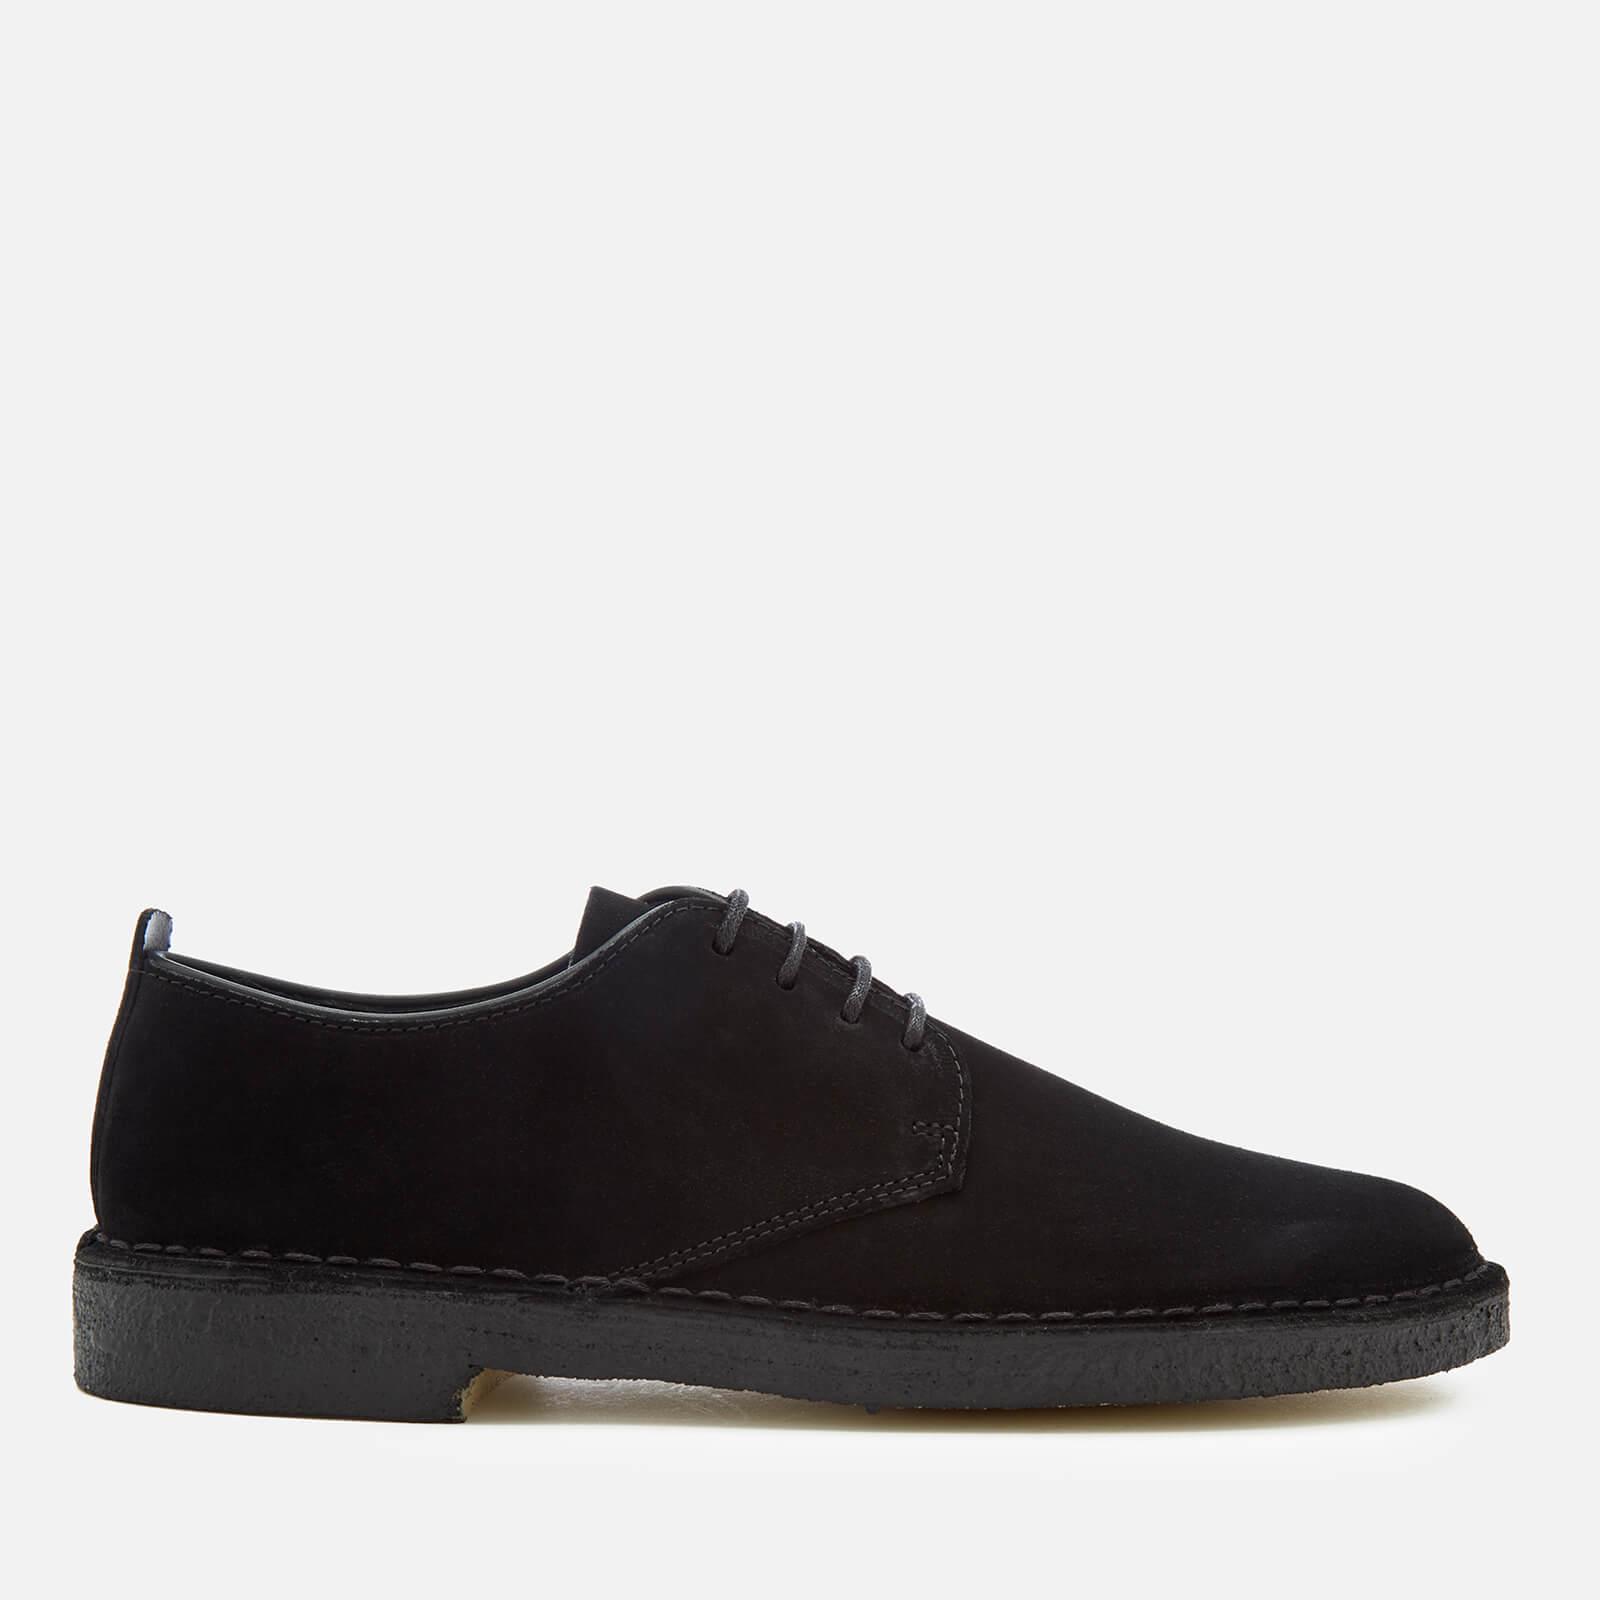 Clarks Originals Men's Desert London Shoes - Black - UK 10 - Black